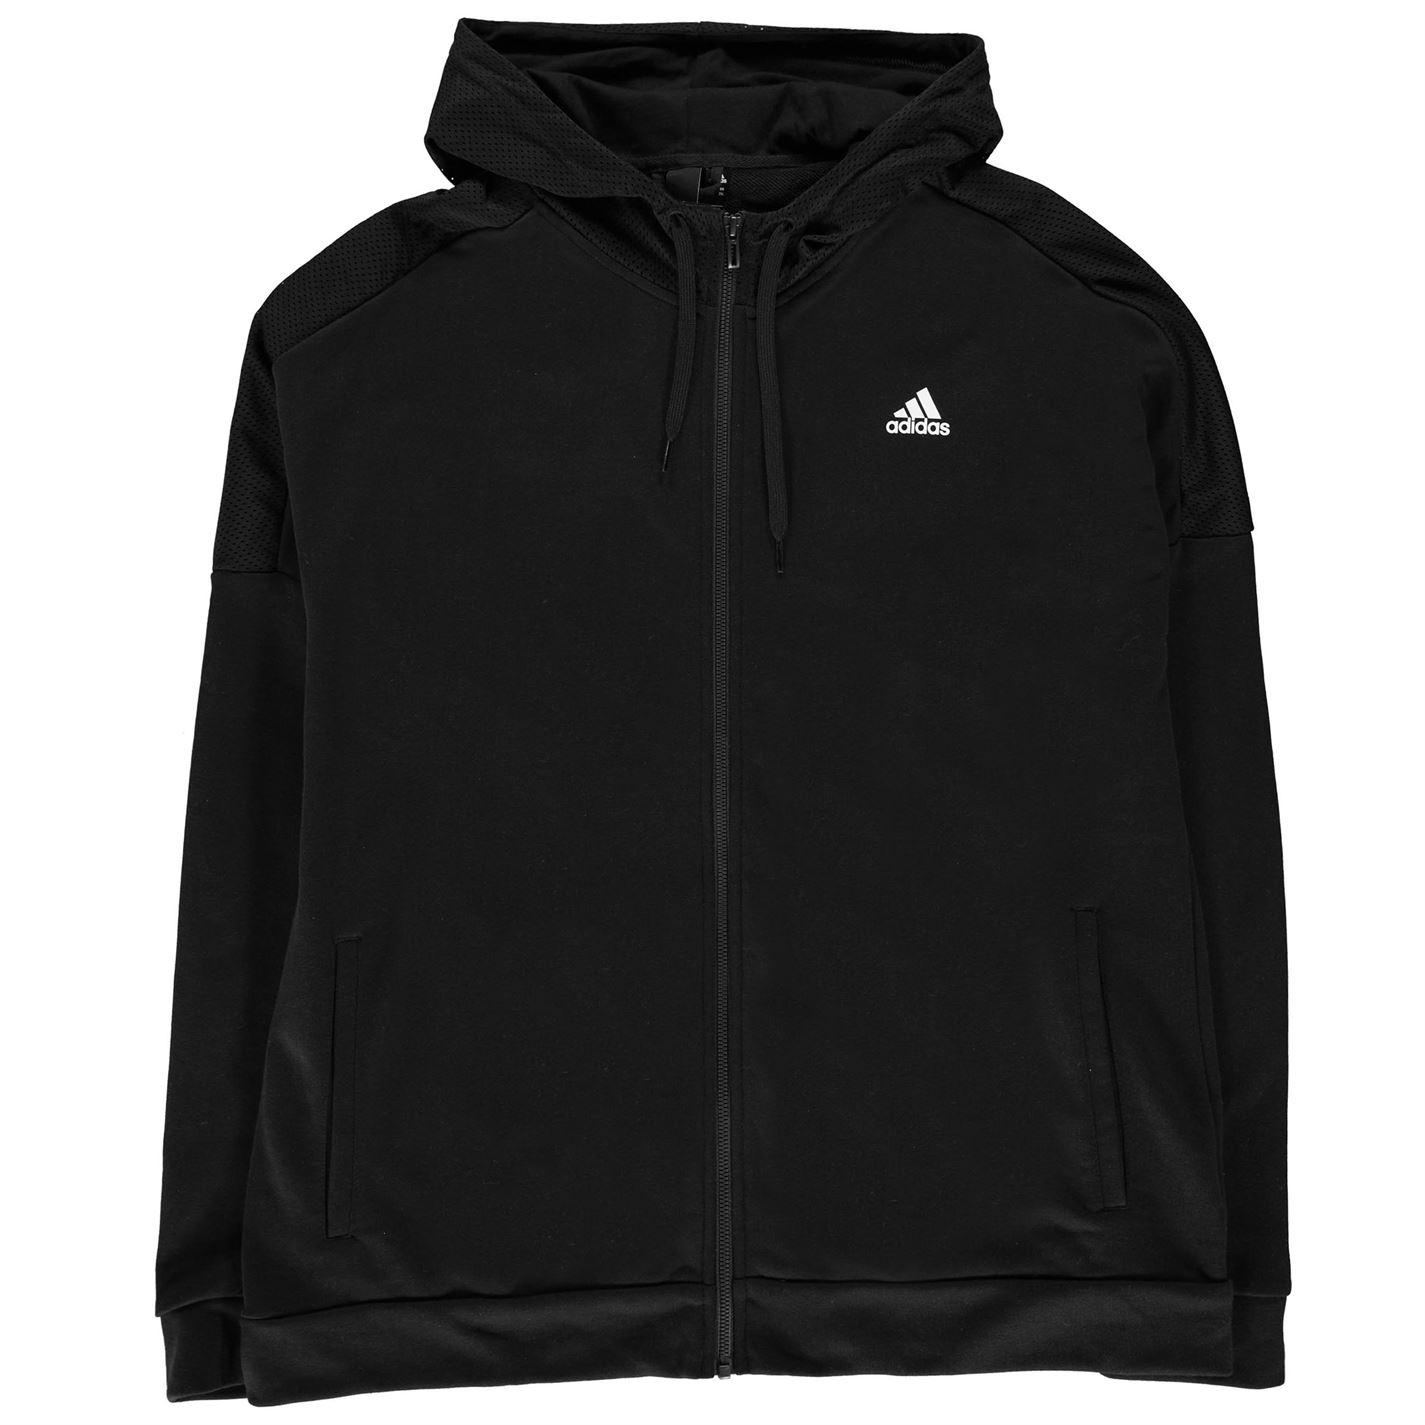 Adidas SID Full Zip Hoody Mens